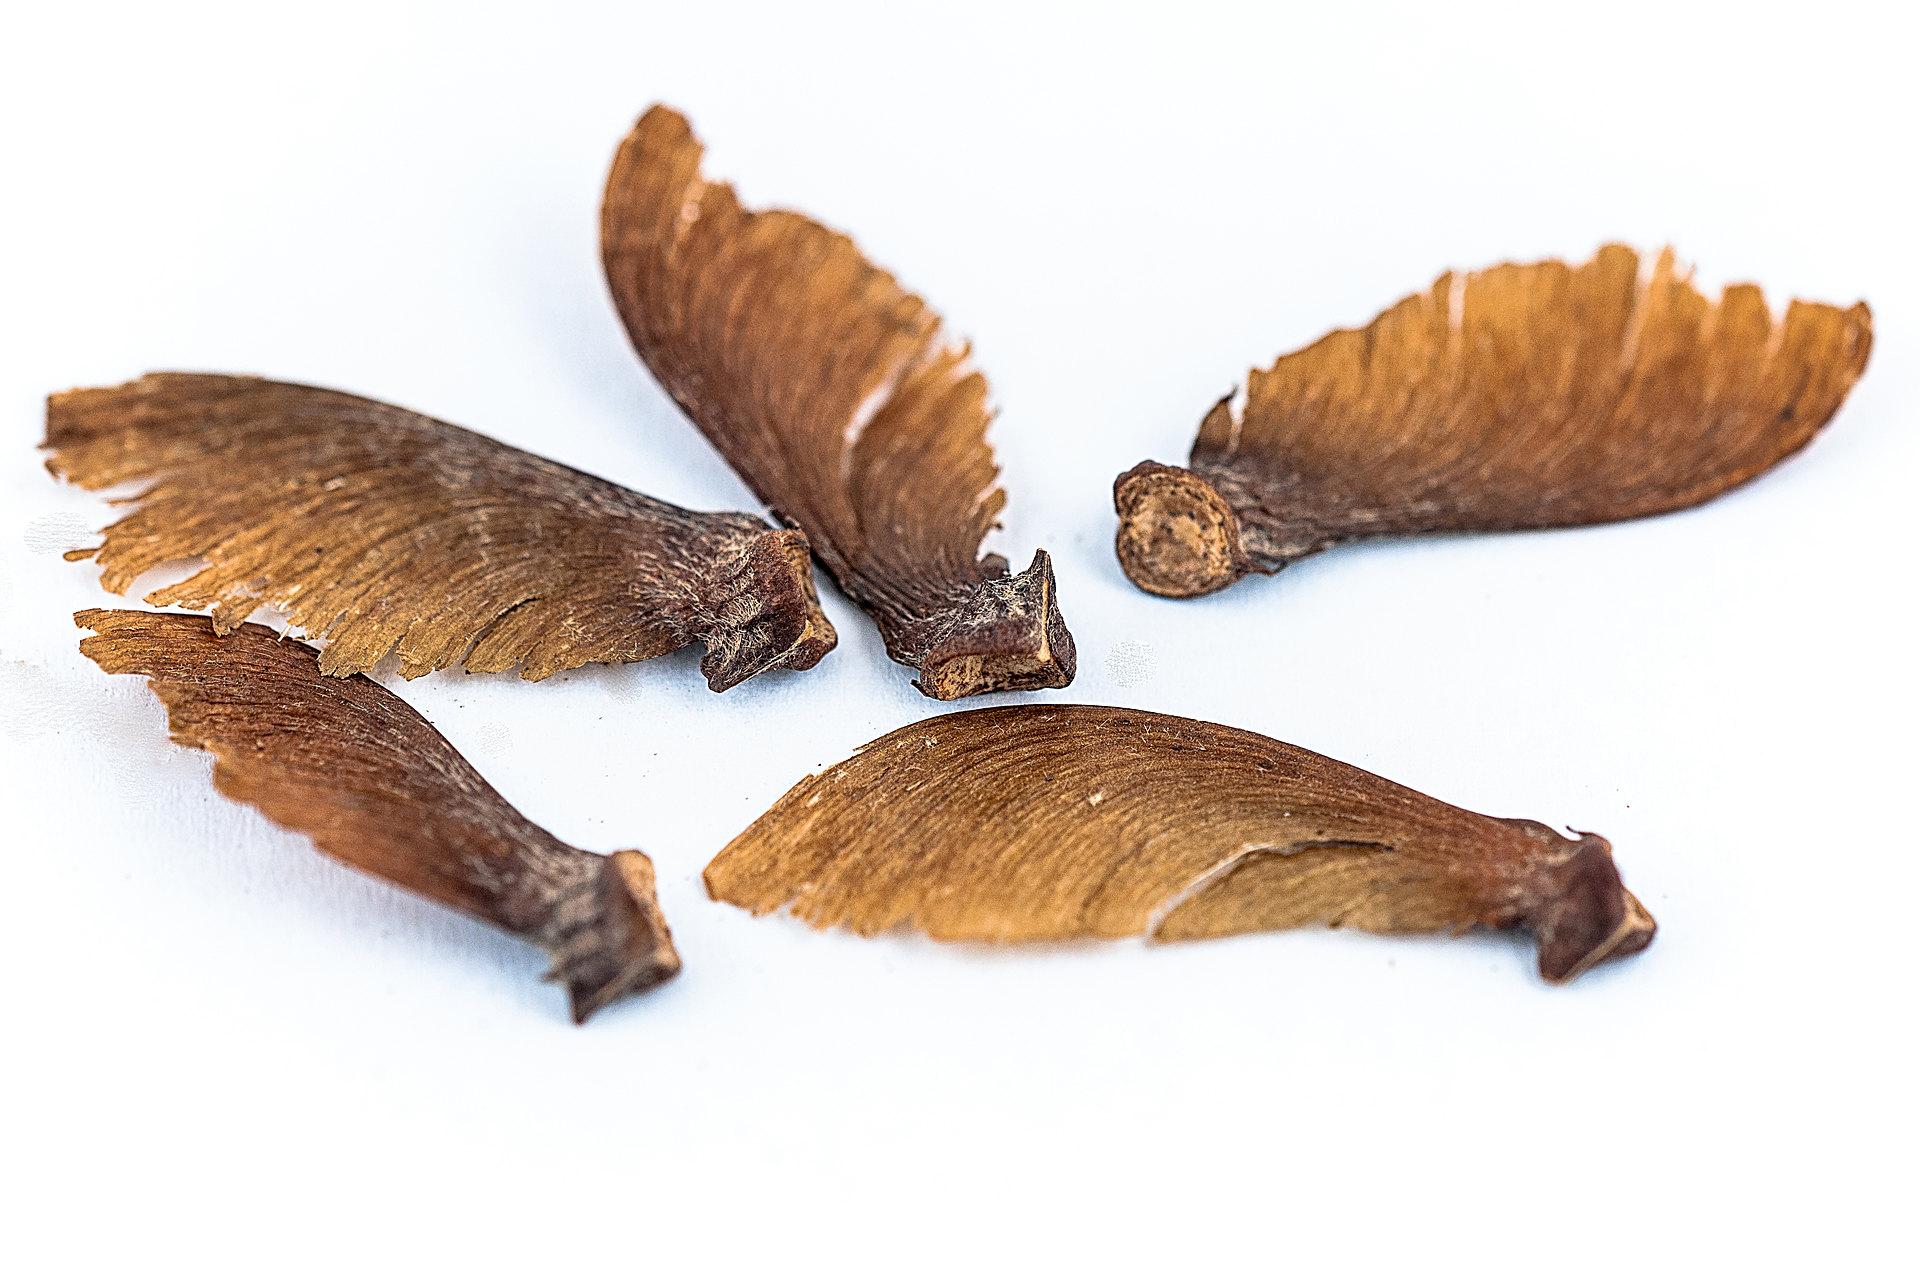 Banisteriopsis caapi - Ayahuasca